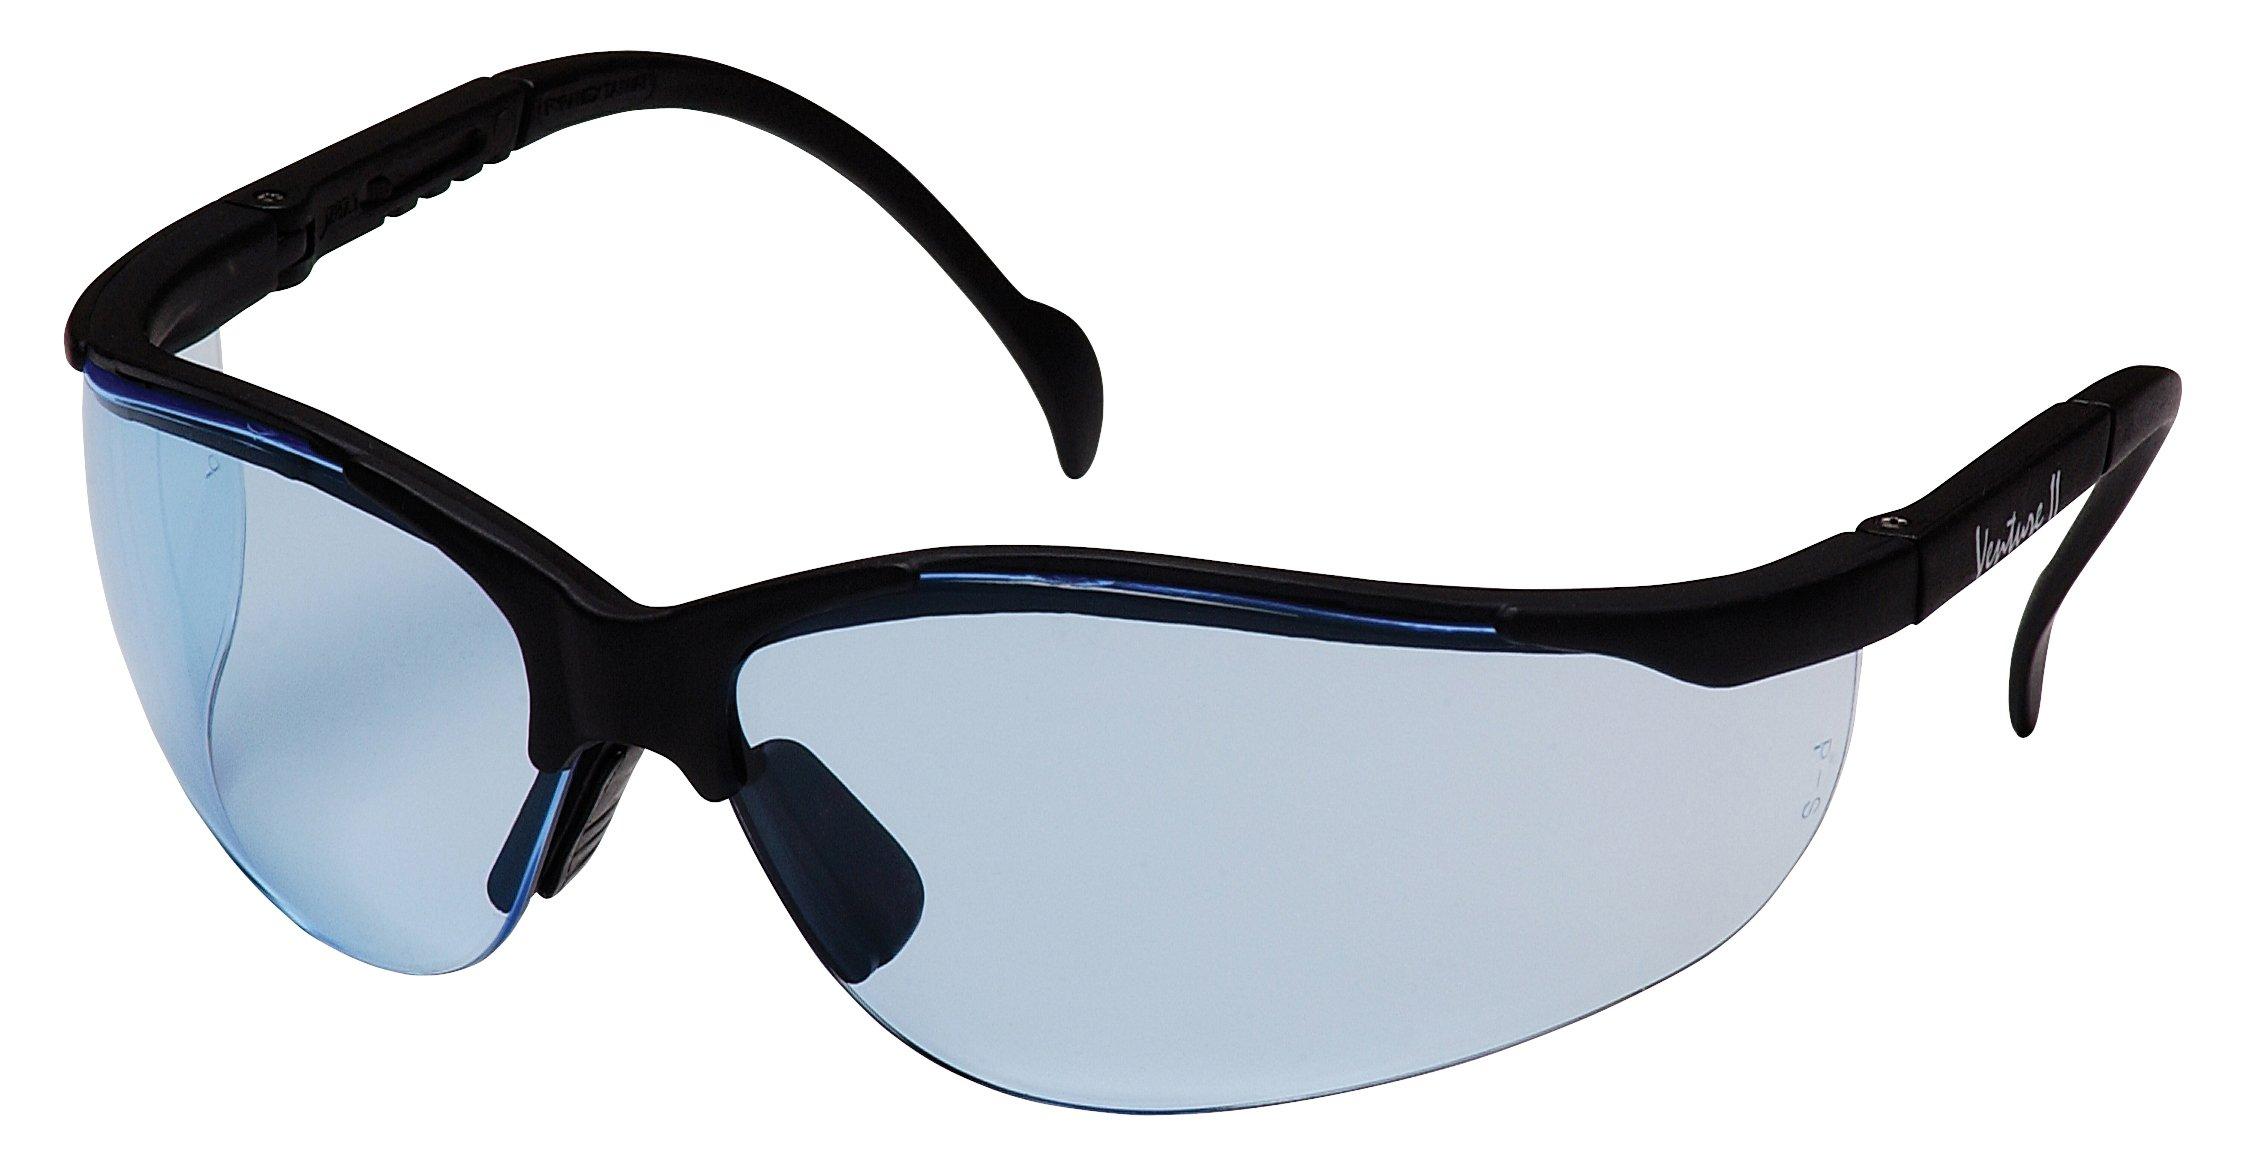 Pyramex Venture Ii Safety Eyewear, Infinity Blue Lens With Black Frame by Pyramex Safety